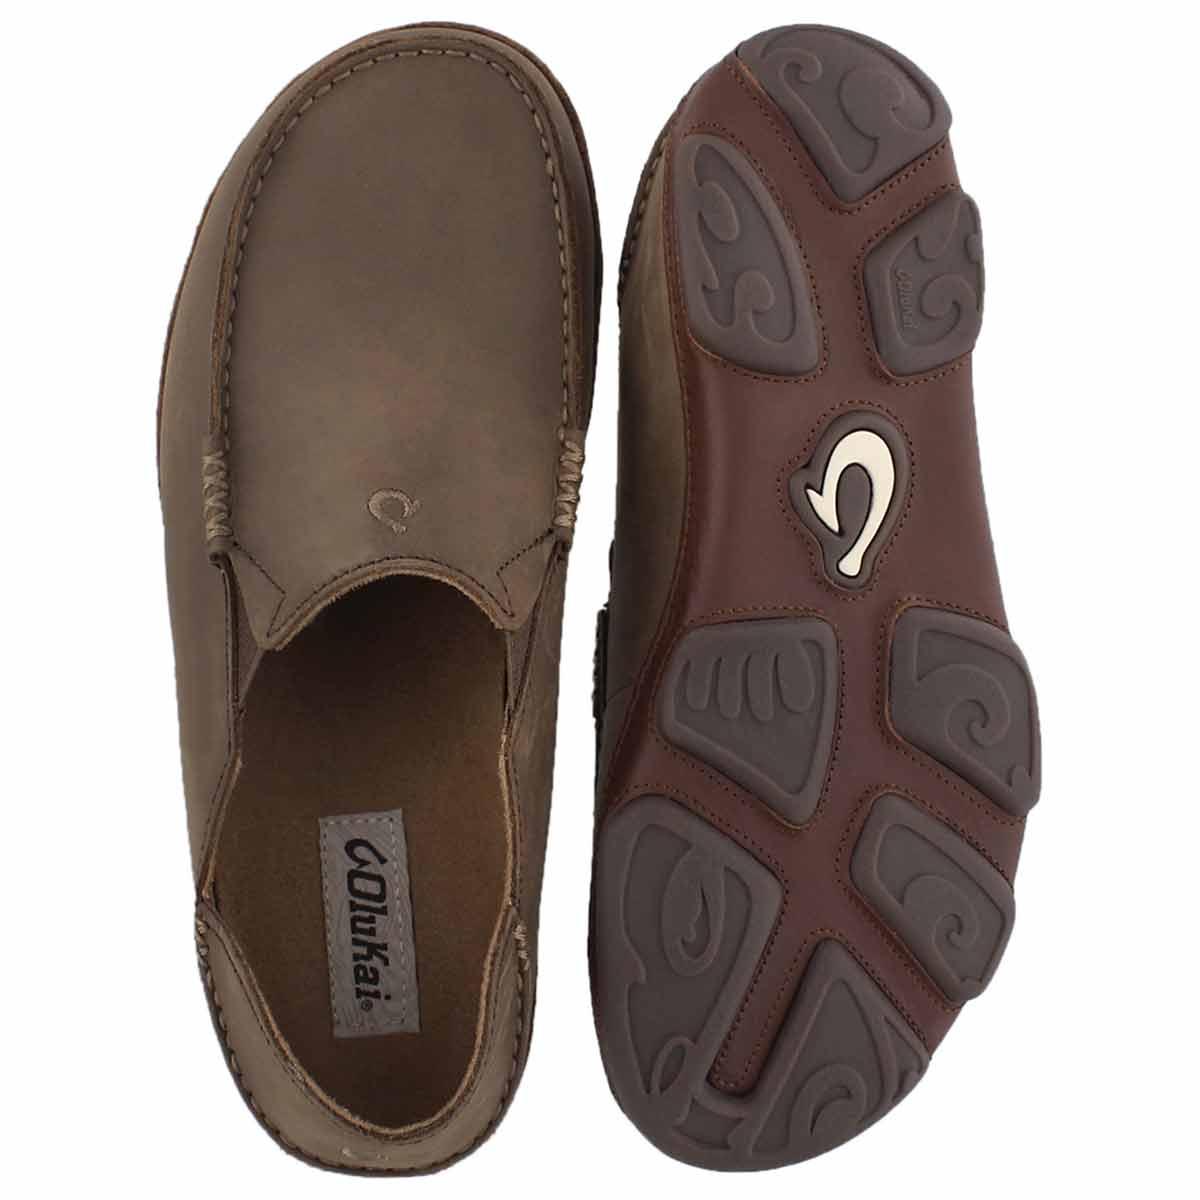 Mns Moloa toffee slip on casual shoe